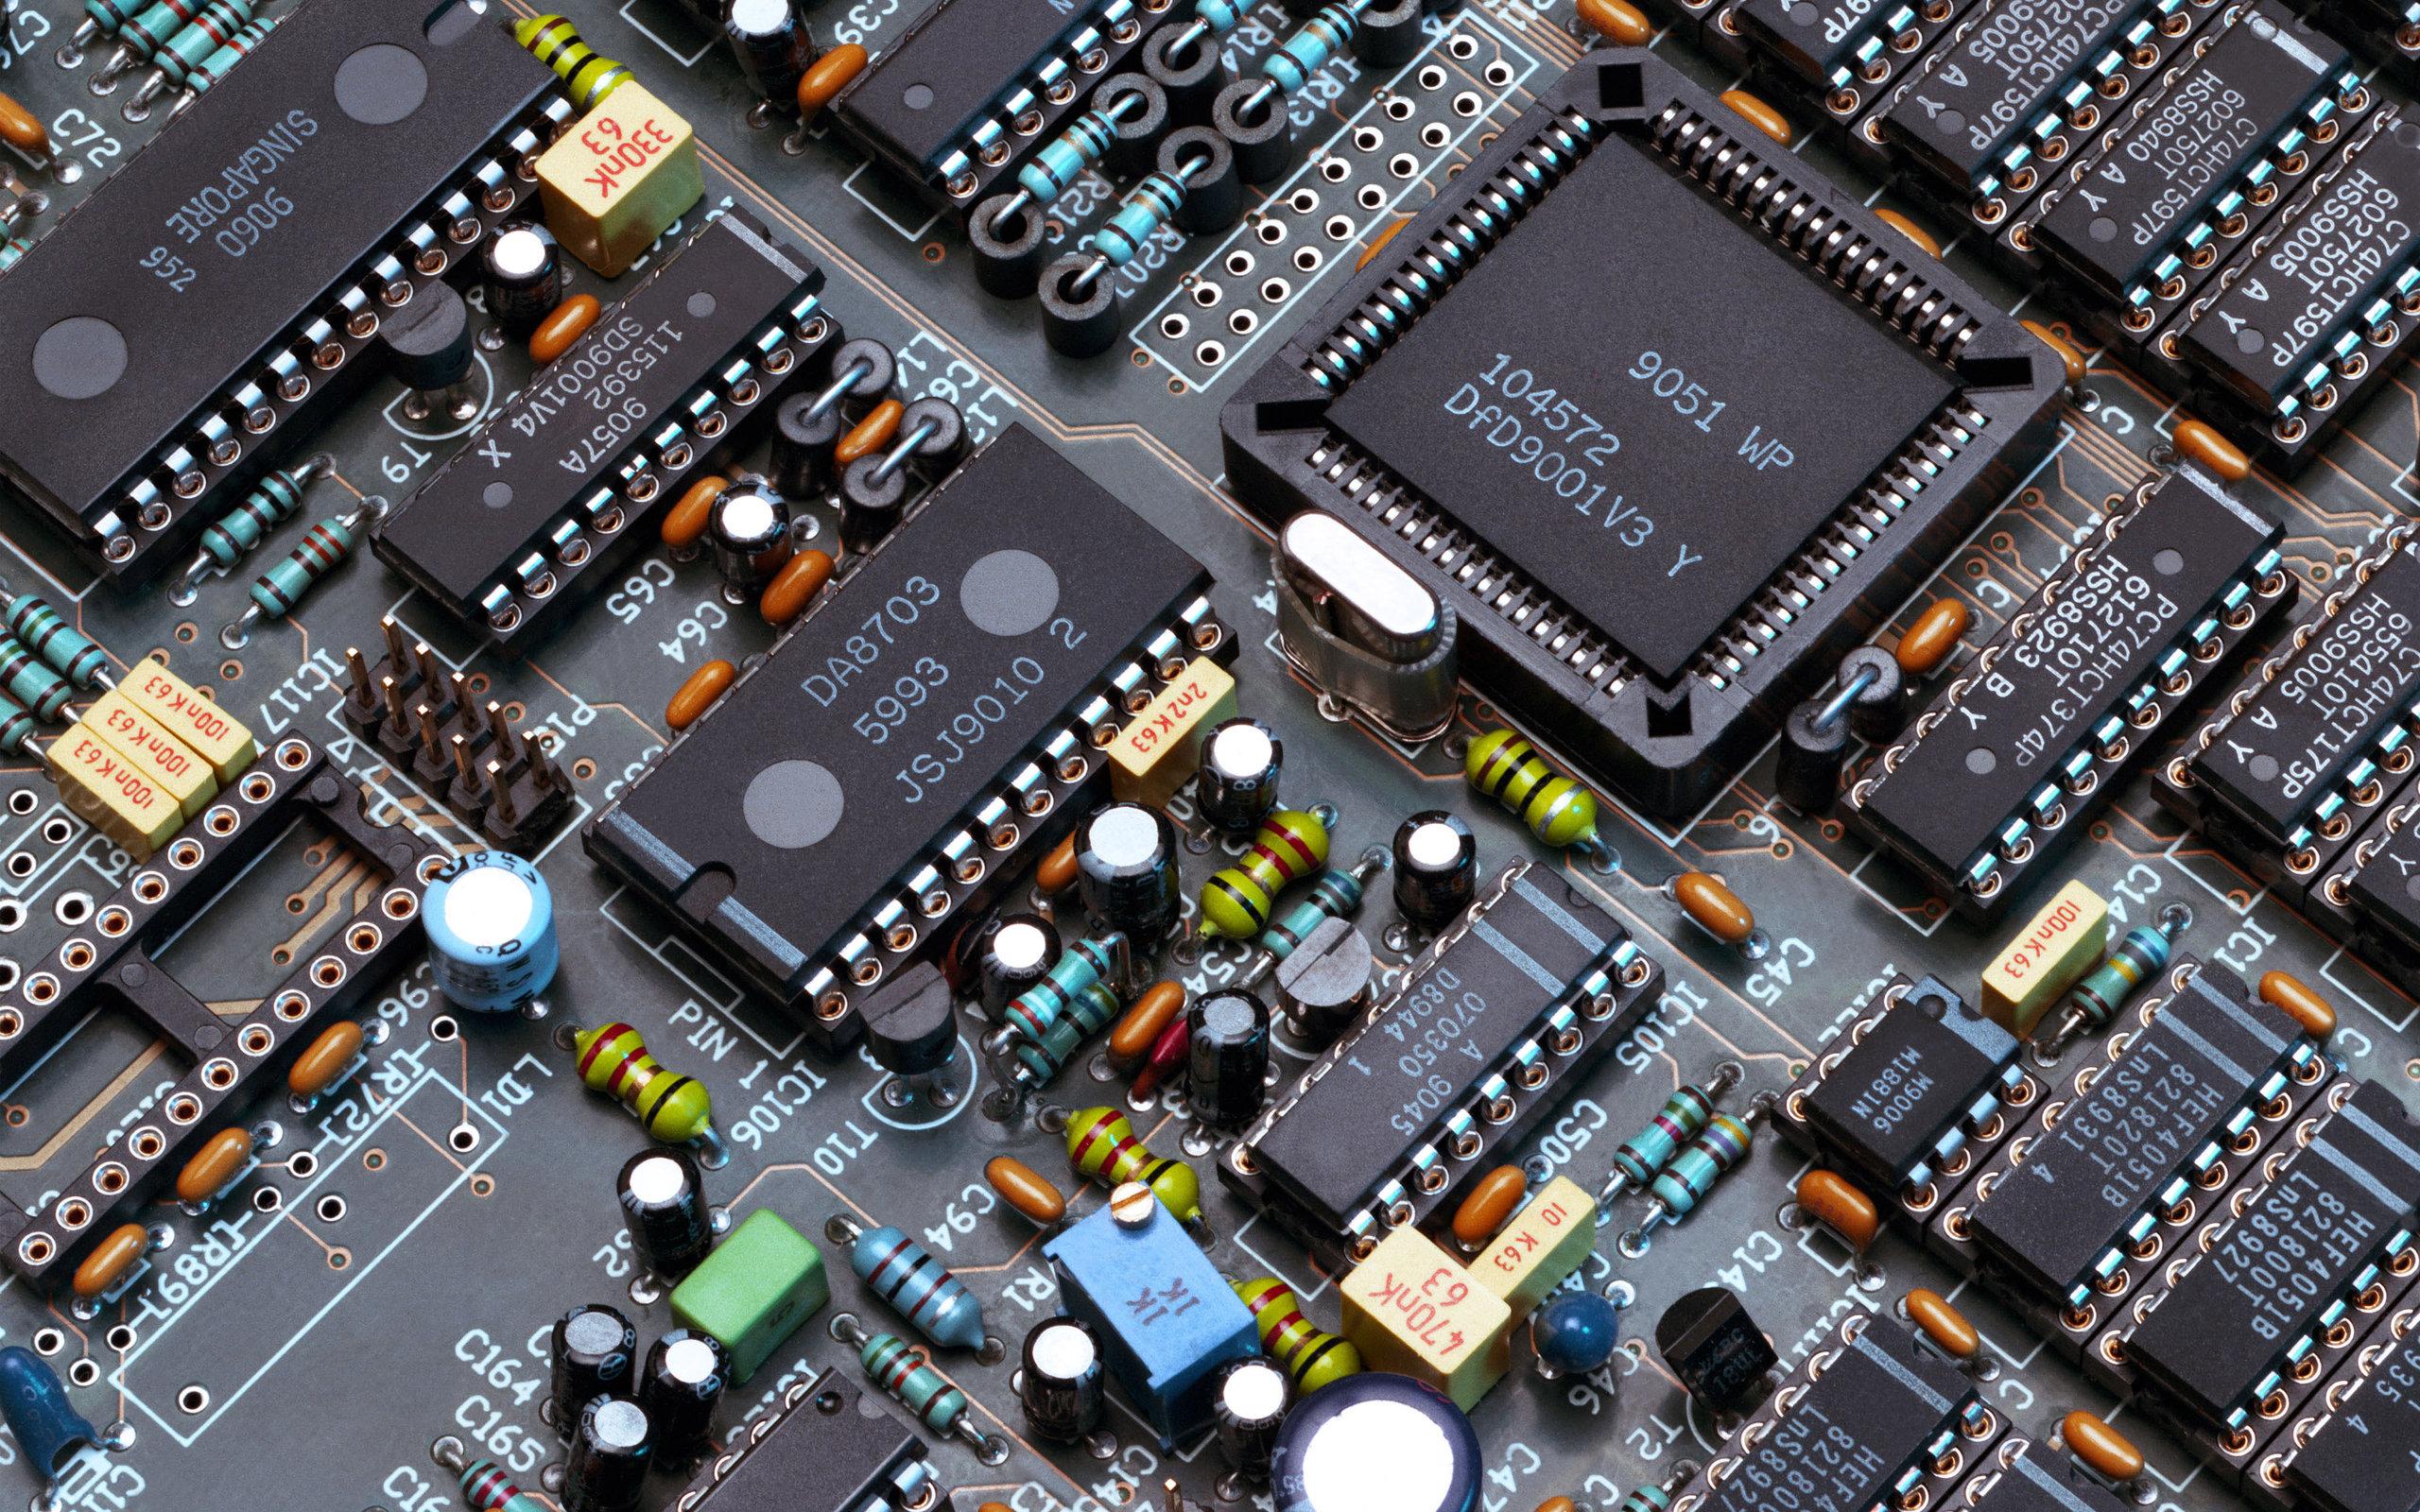 Printed Circuit Board Wallpaper Wallpapersafari Electronic Royalty Free Stock Photography Desktop Wallpapers On Latorocom 2560x1600